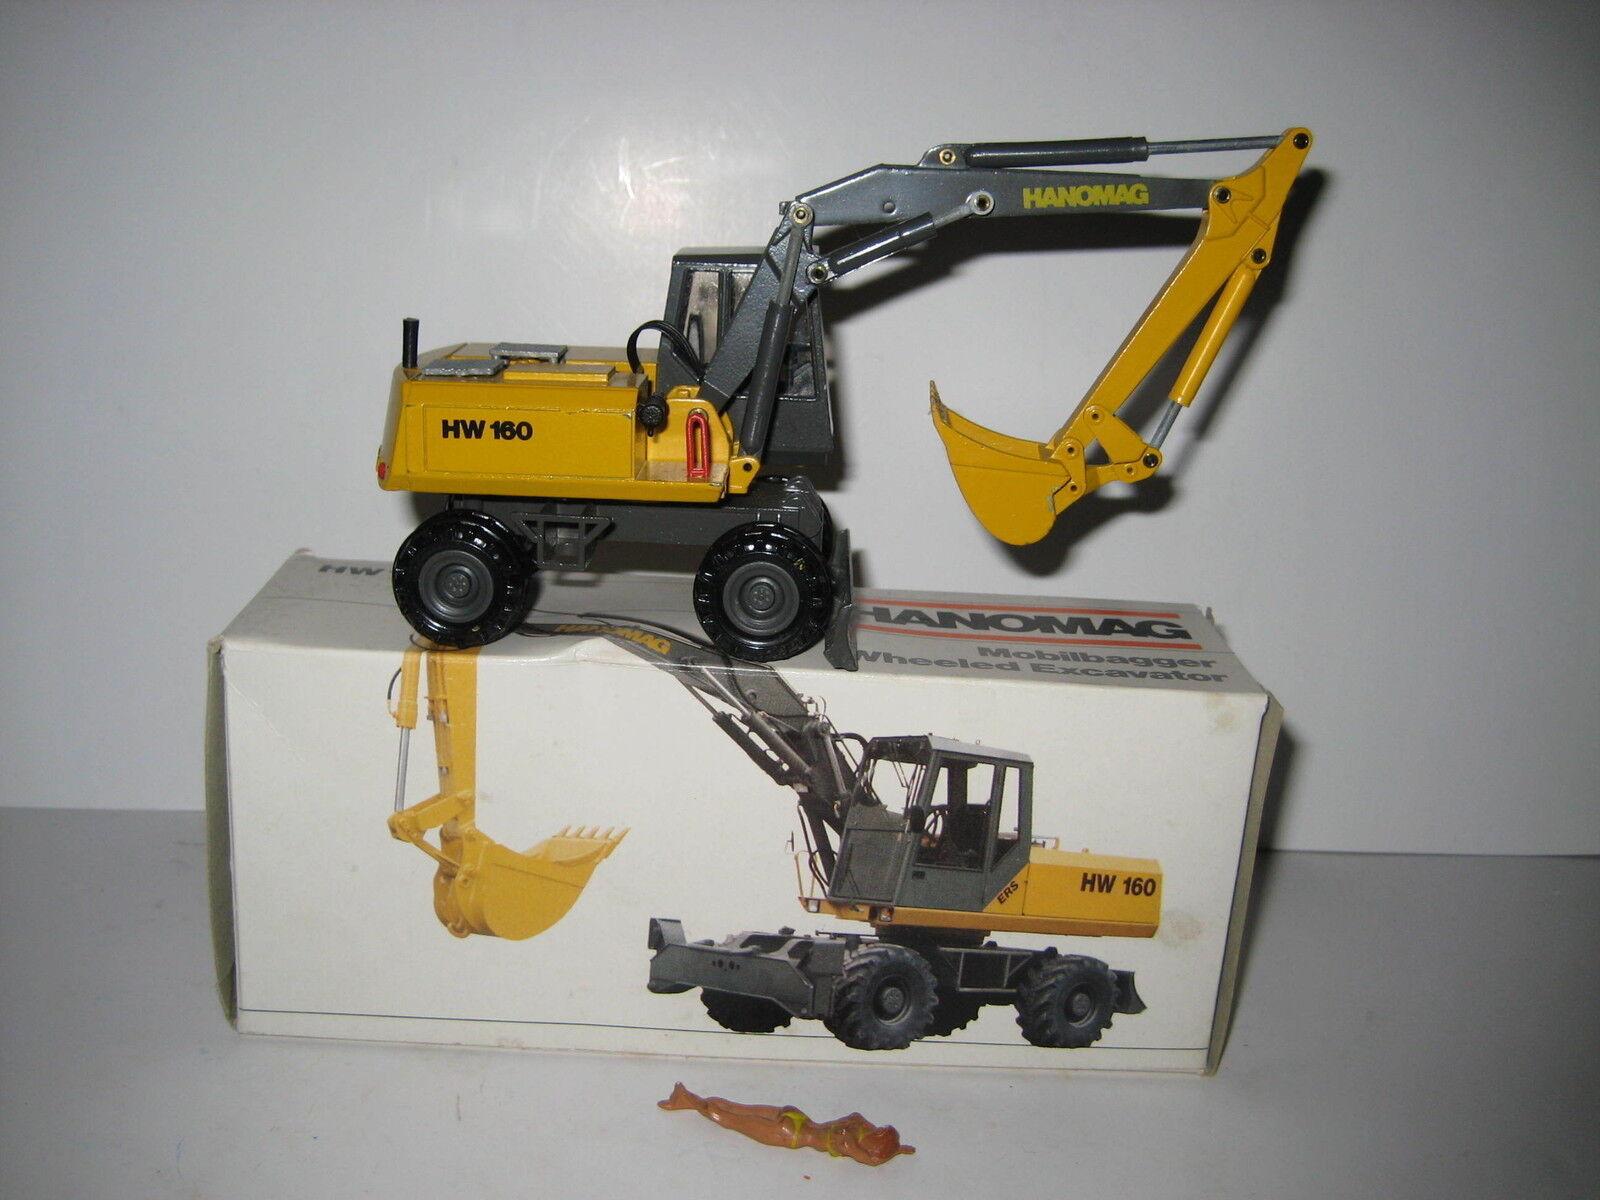 Hanomag HW 160 Excavateurs tieflöffel mobile  2817.2 CONRAD 1 50 NEUF dans sa boîte